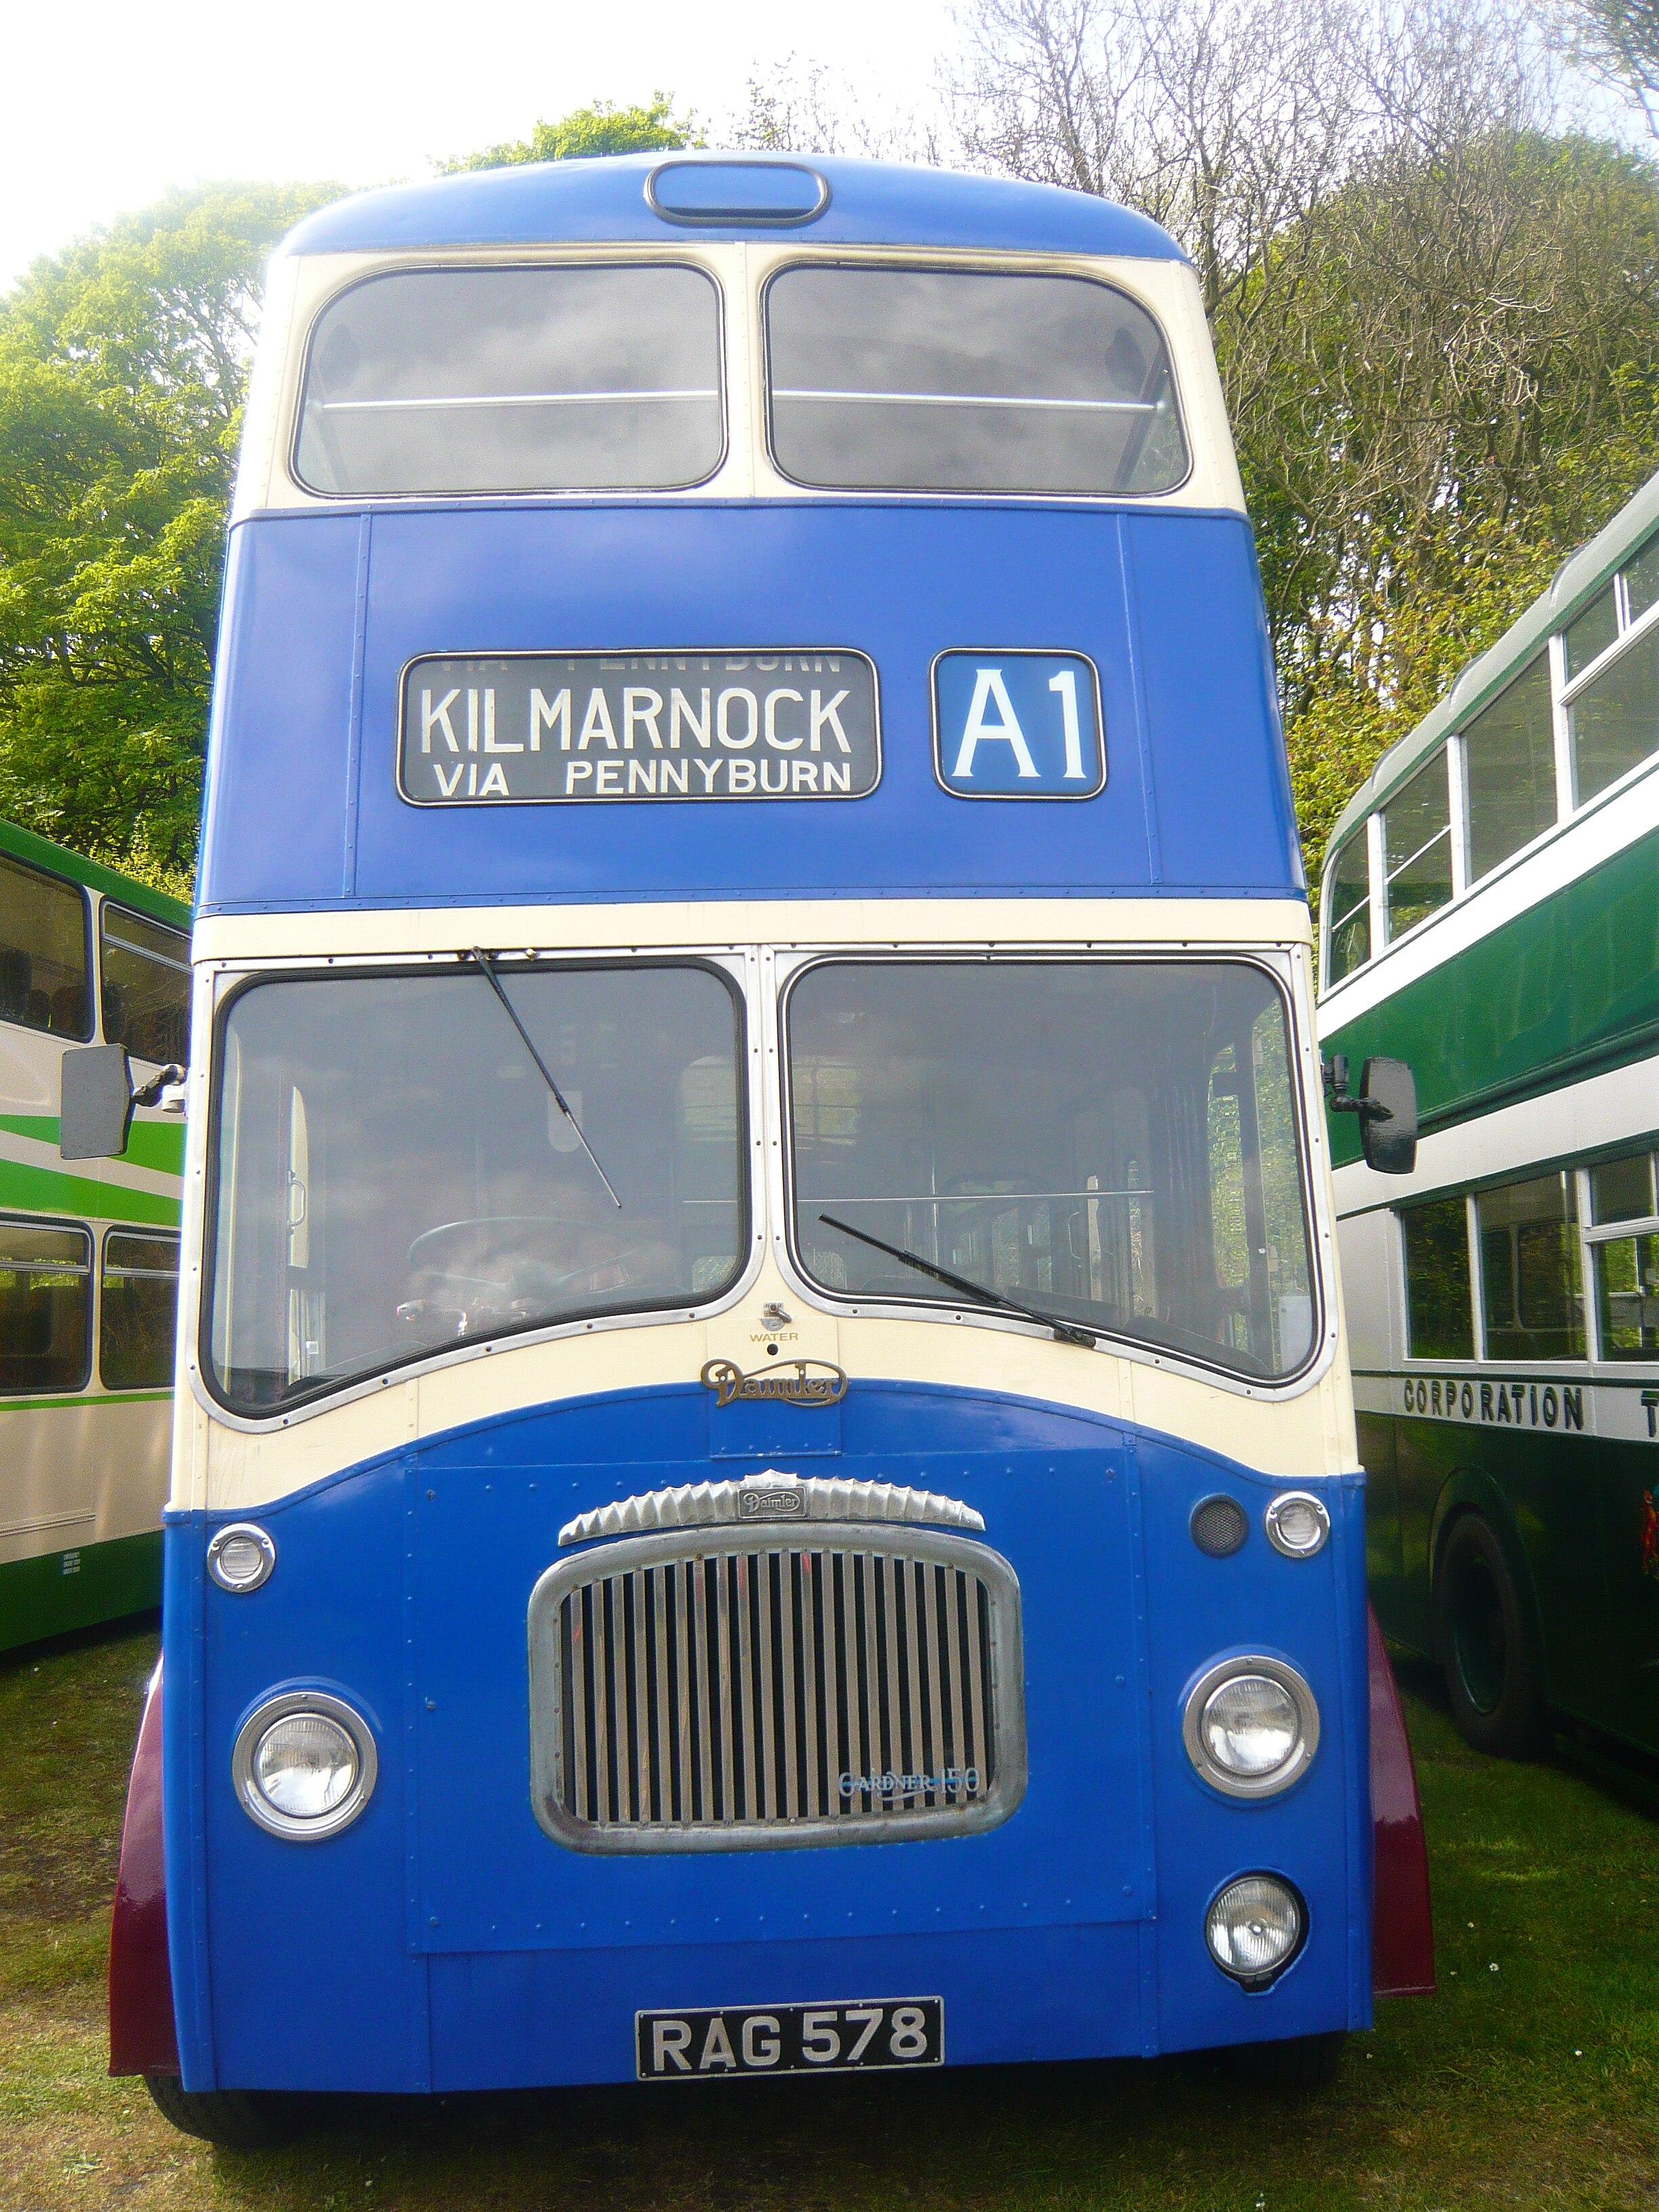 File:A1 Service bus (RAG 578), SVBM 16 May 2010 jpg